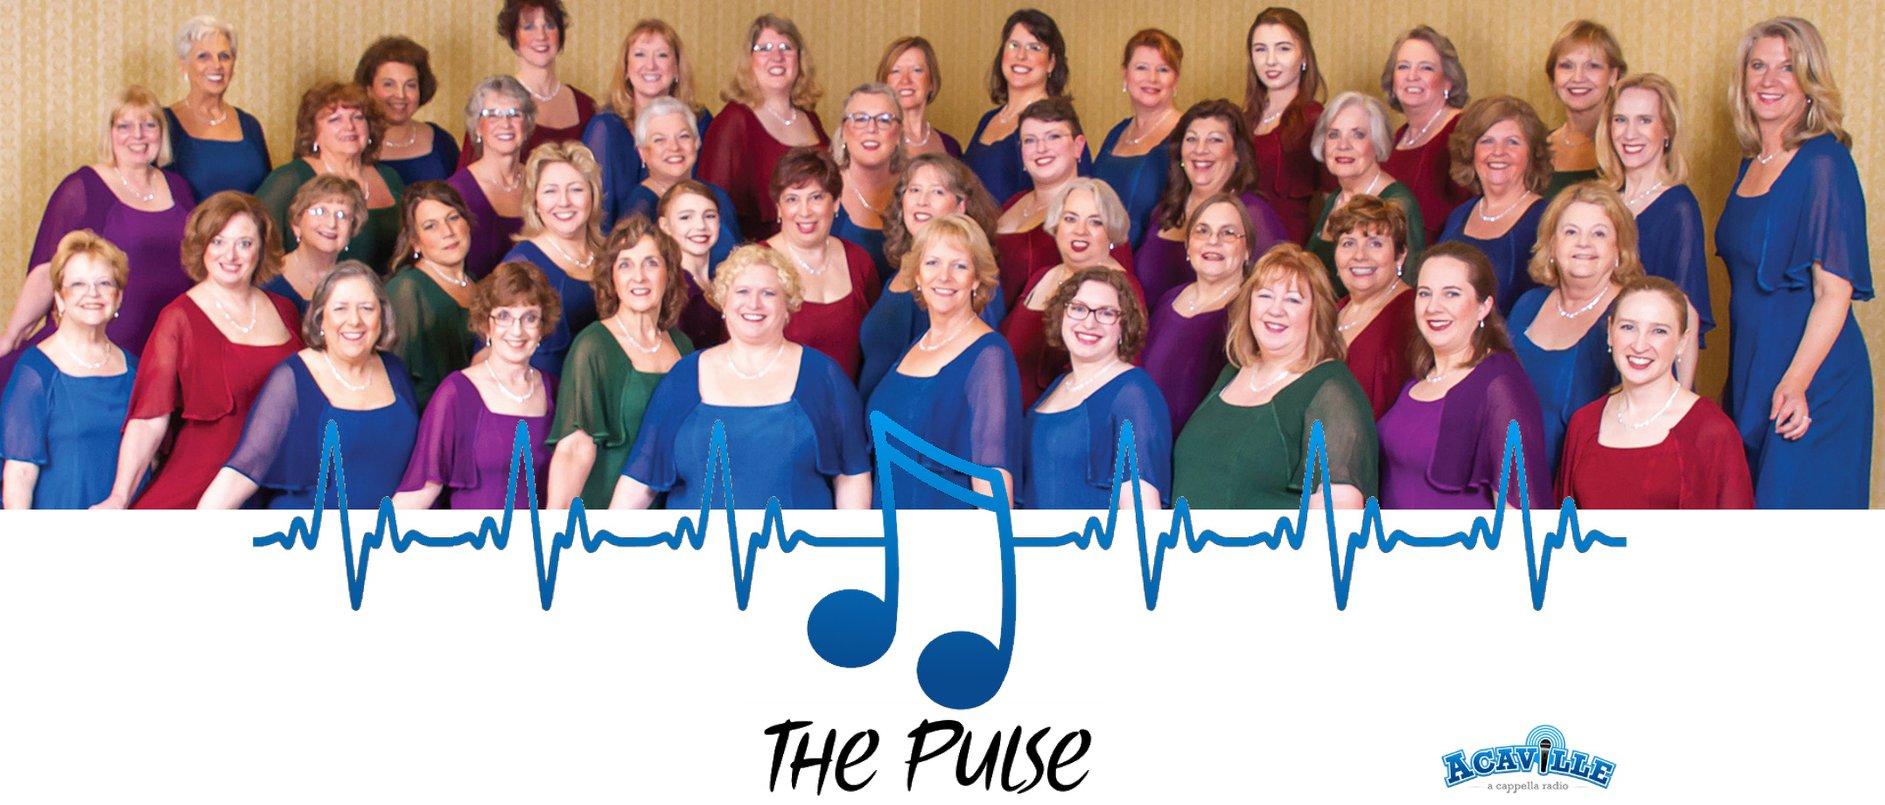 The Pulse - NEVIH